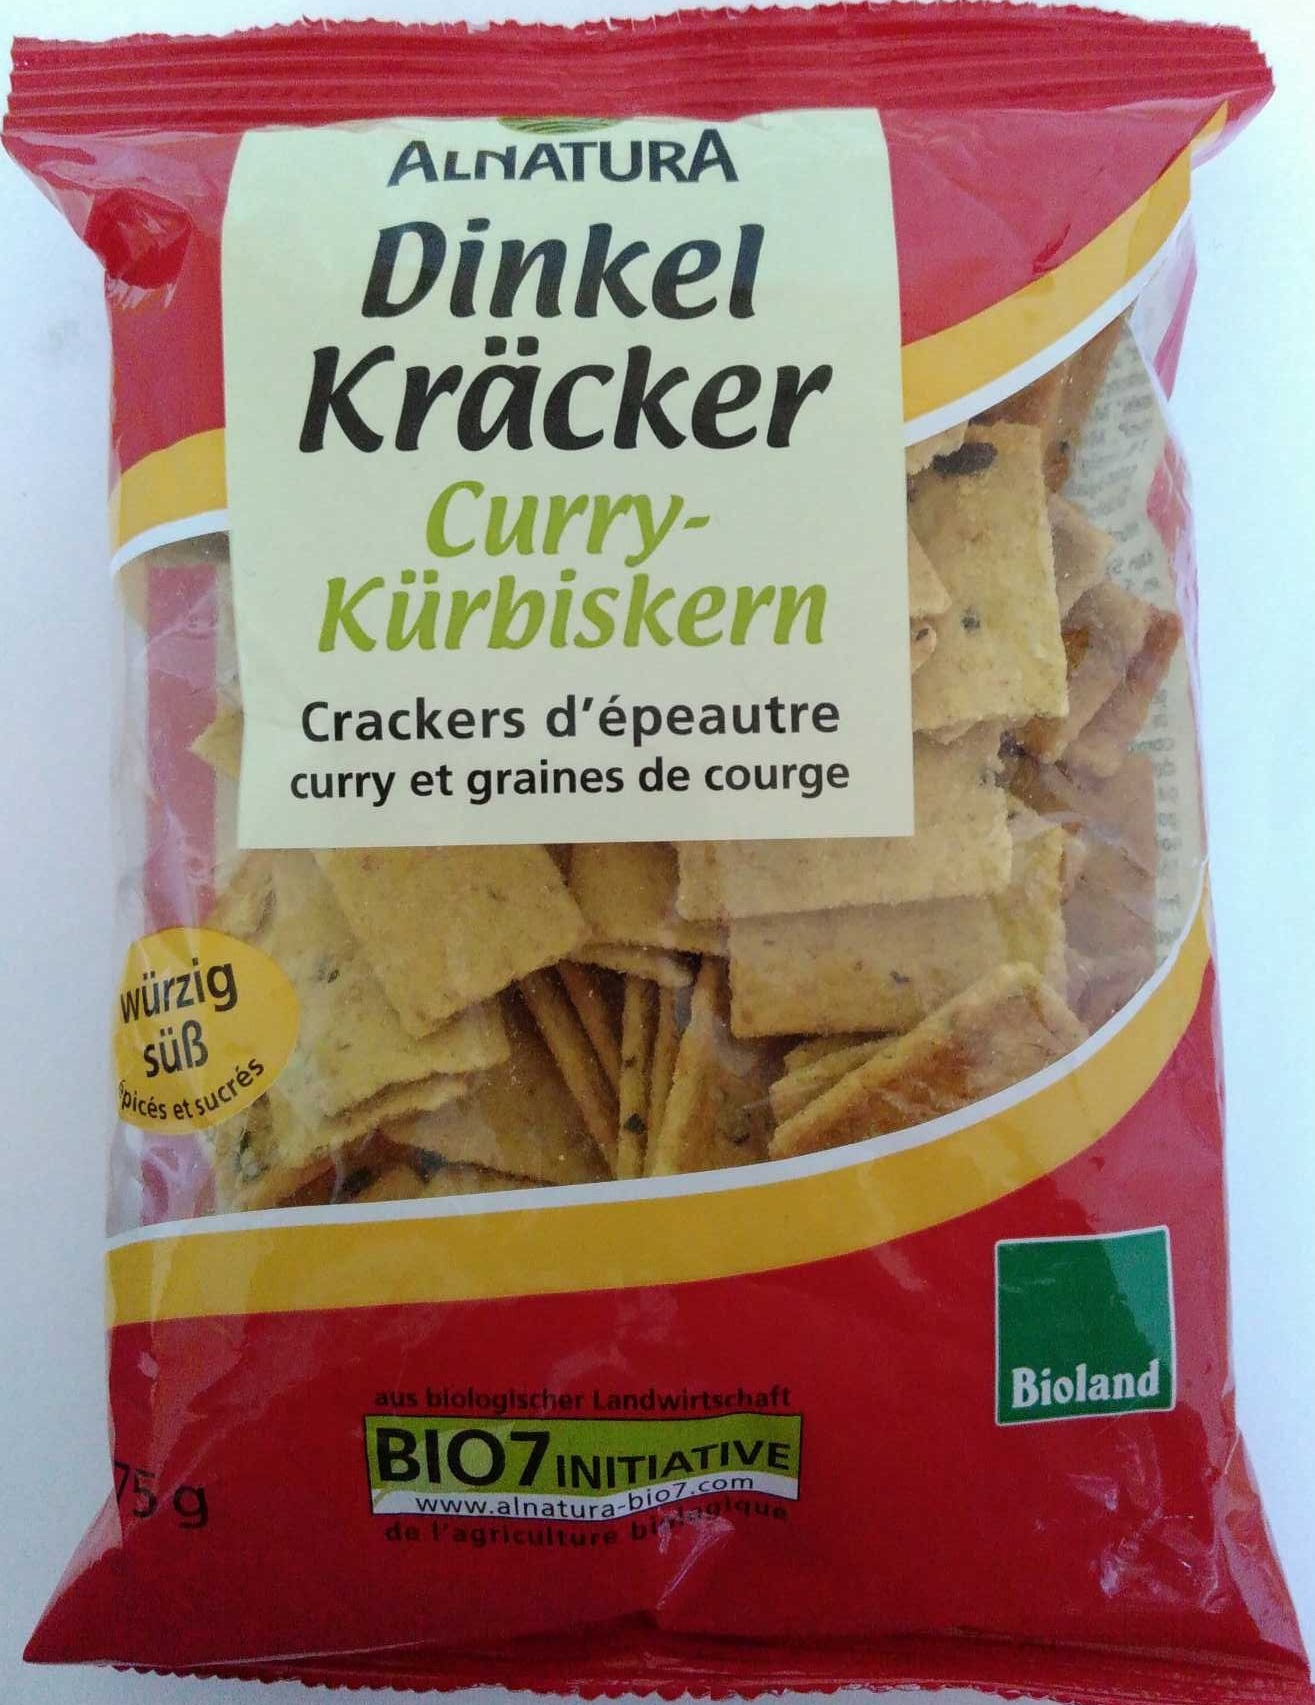 Dinkel Kräcker Curry-Kürbiskern - Prodotto - de